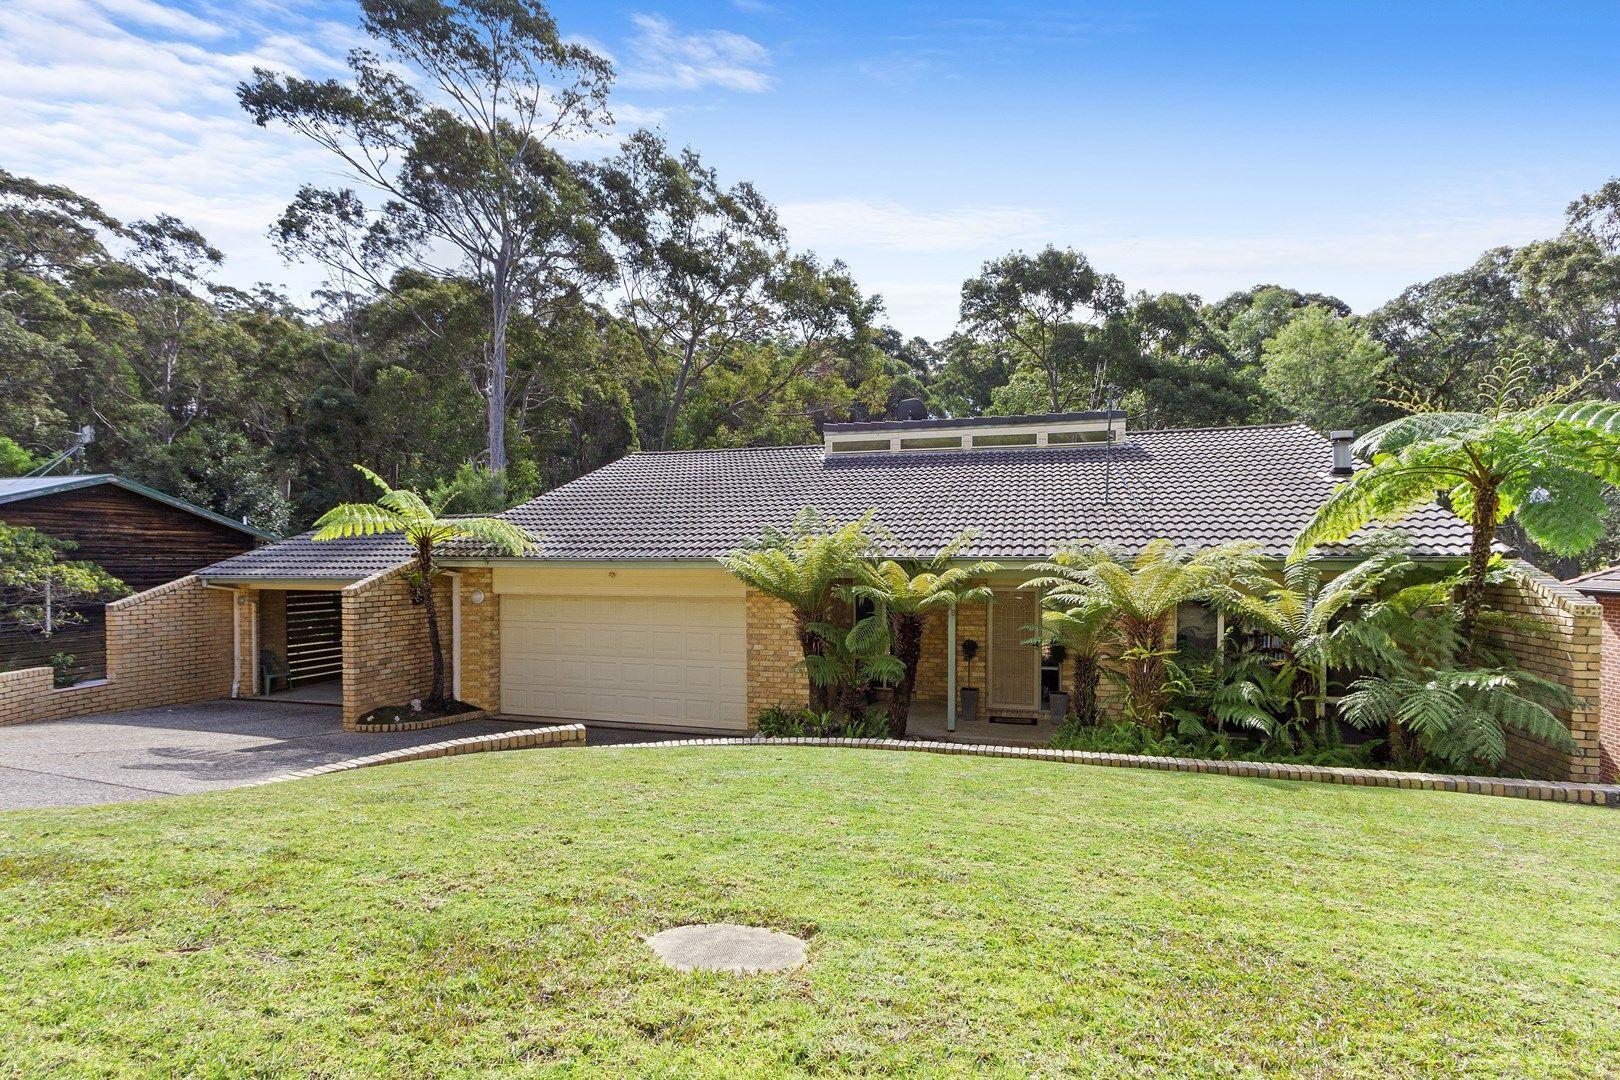 25 Otama Close, Lilli Pilli NSW 2536, Image 0